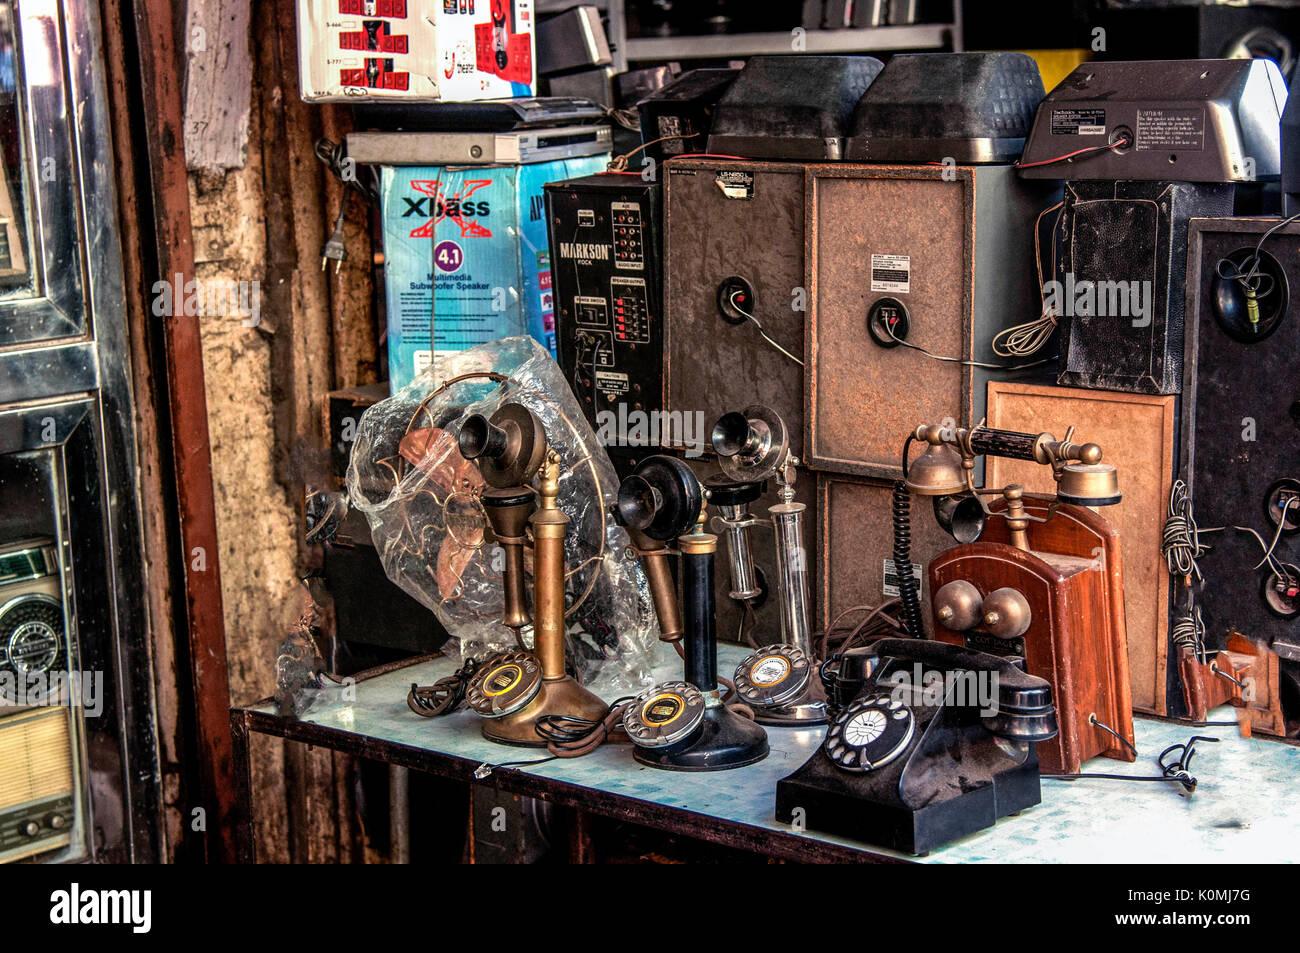 telephones shop chor bazaar, Mumbai, Maharashtra, India, Asia - Stock Image